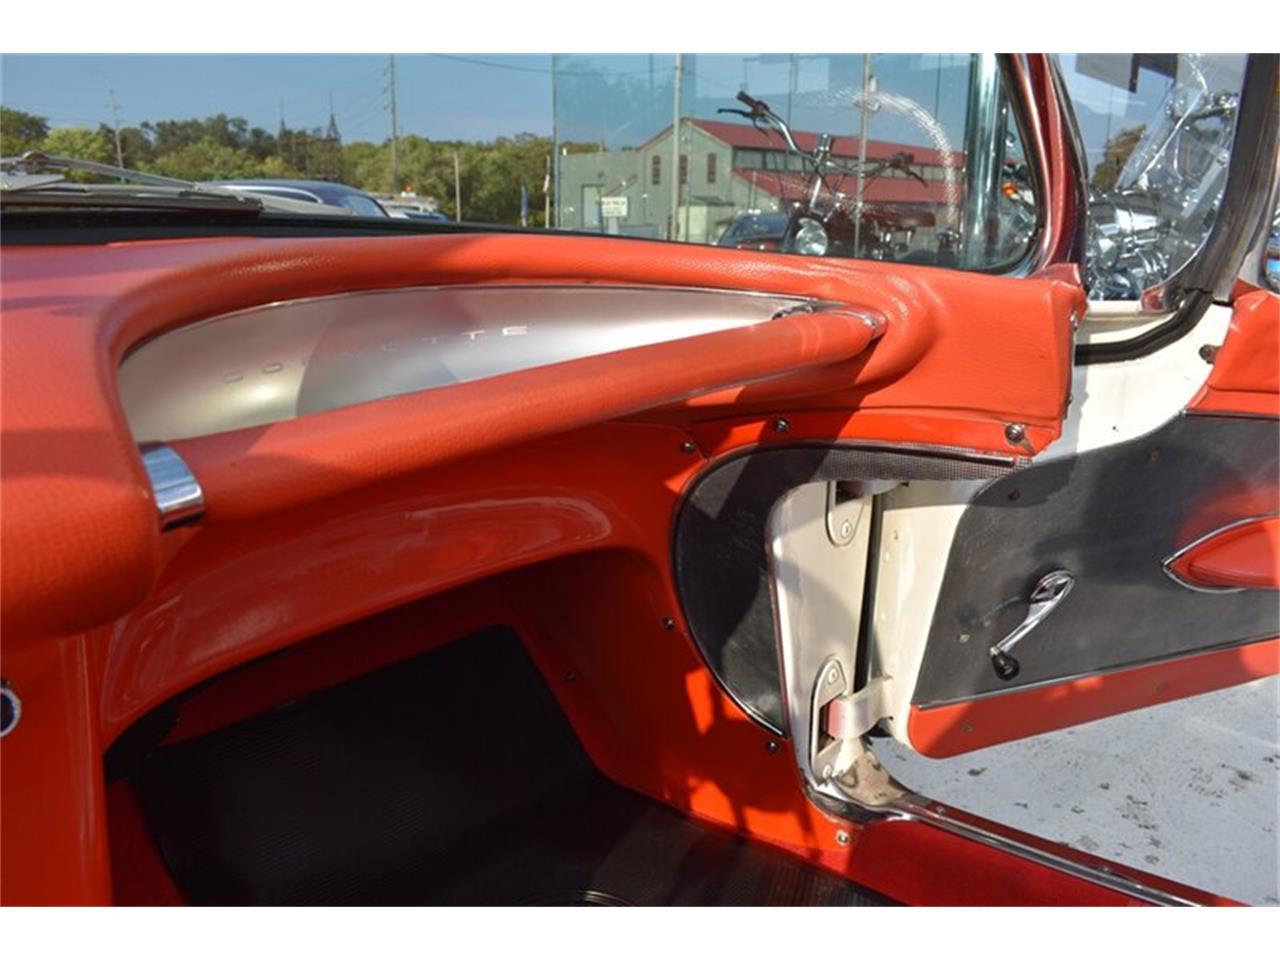 Large Picture of Classic '58 Chevrolet Corvette located in Ohio - $79,900.00 - R23O